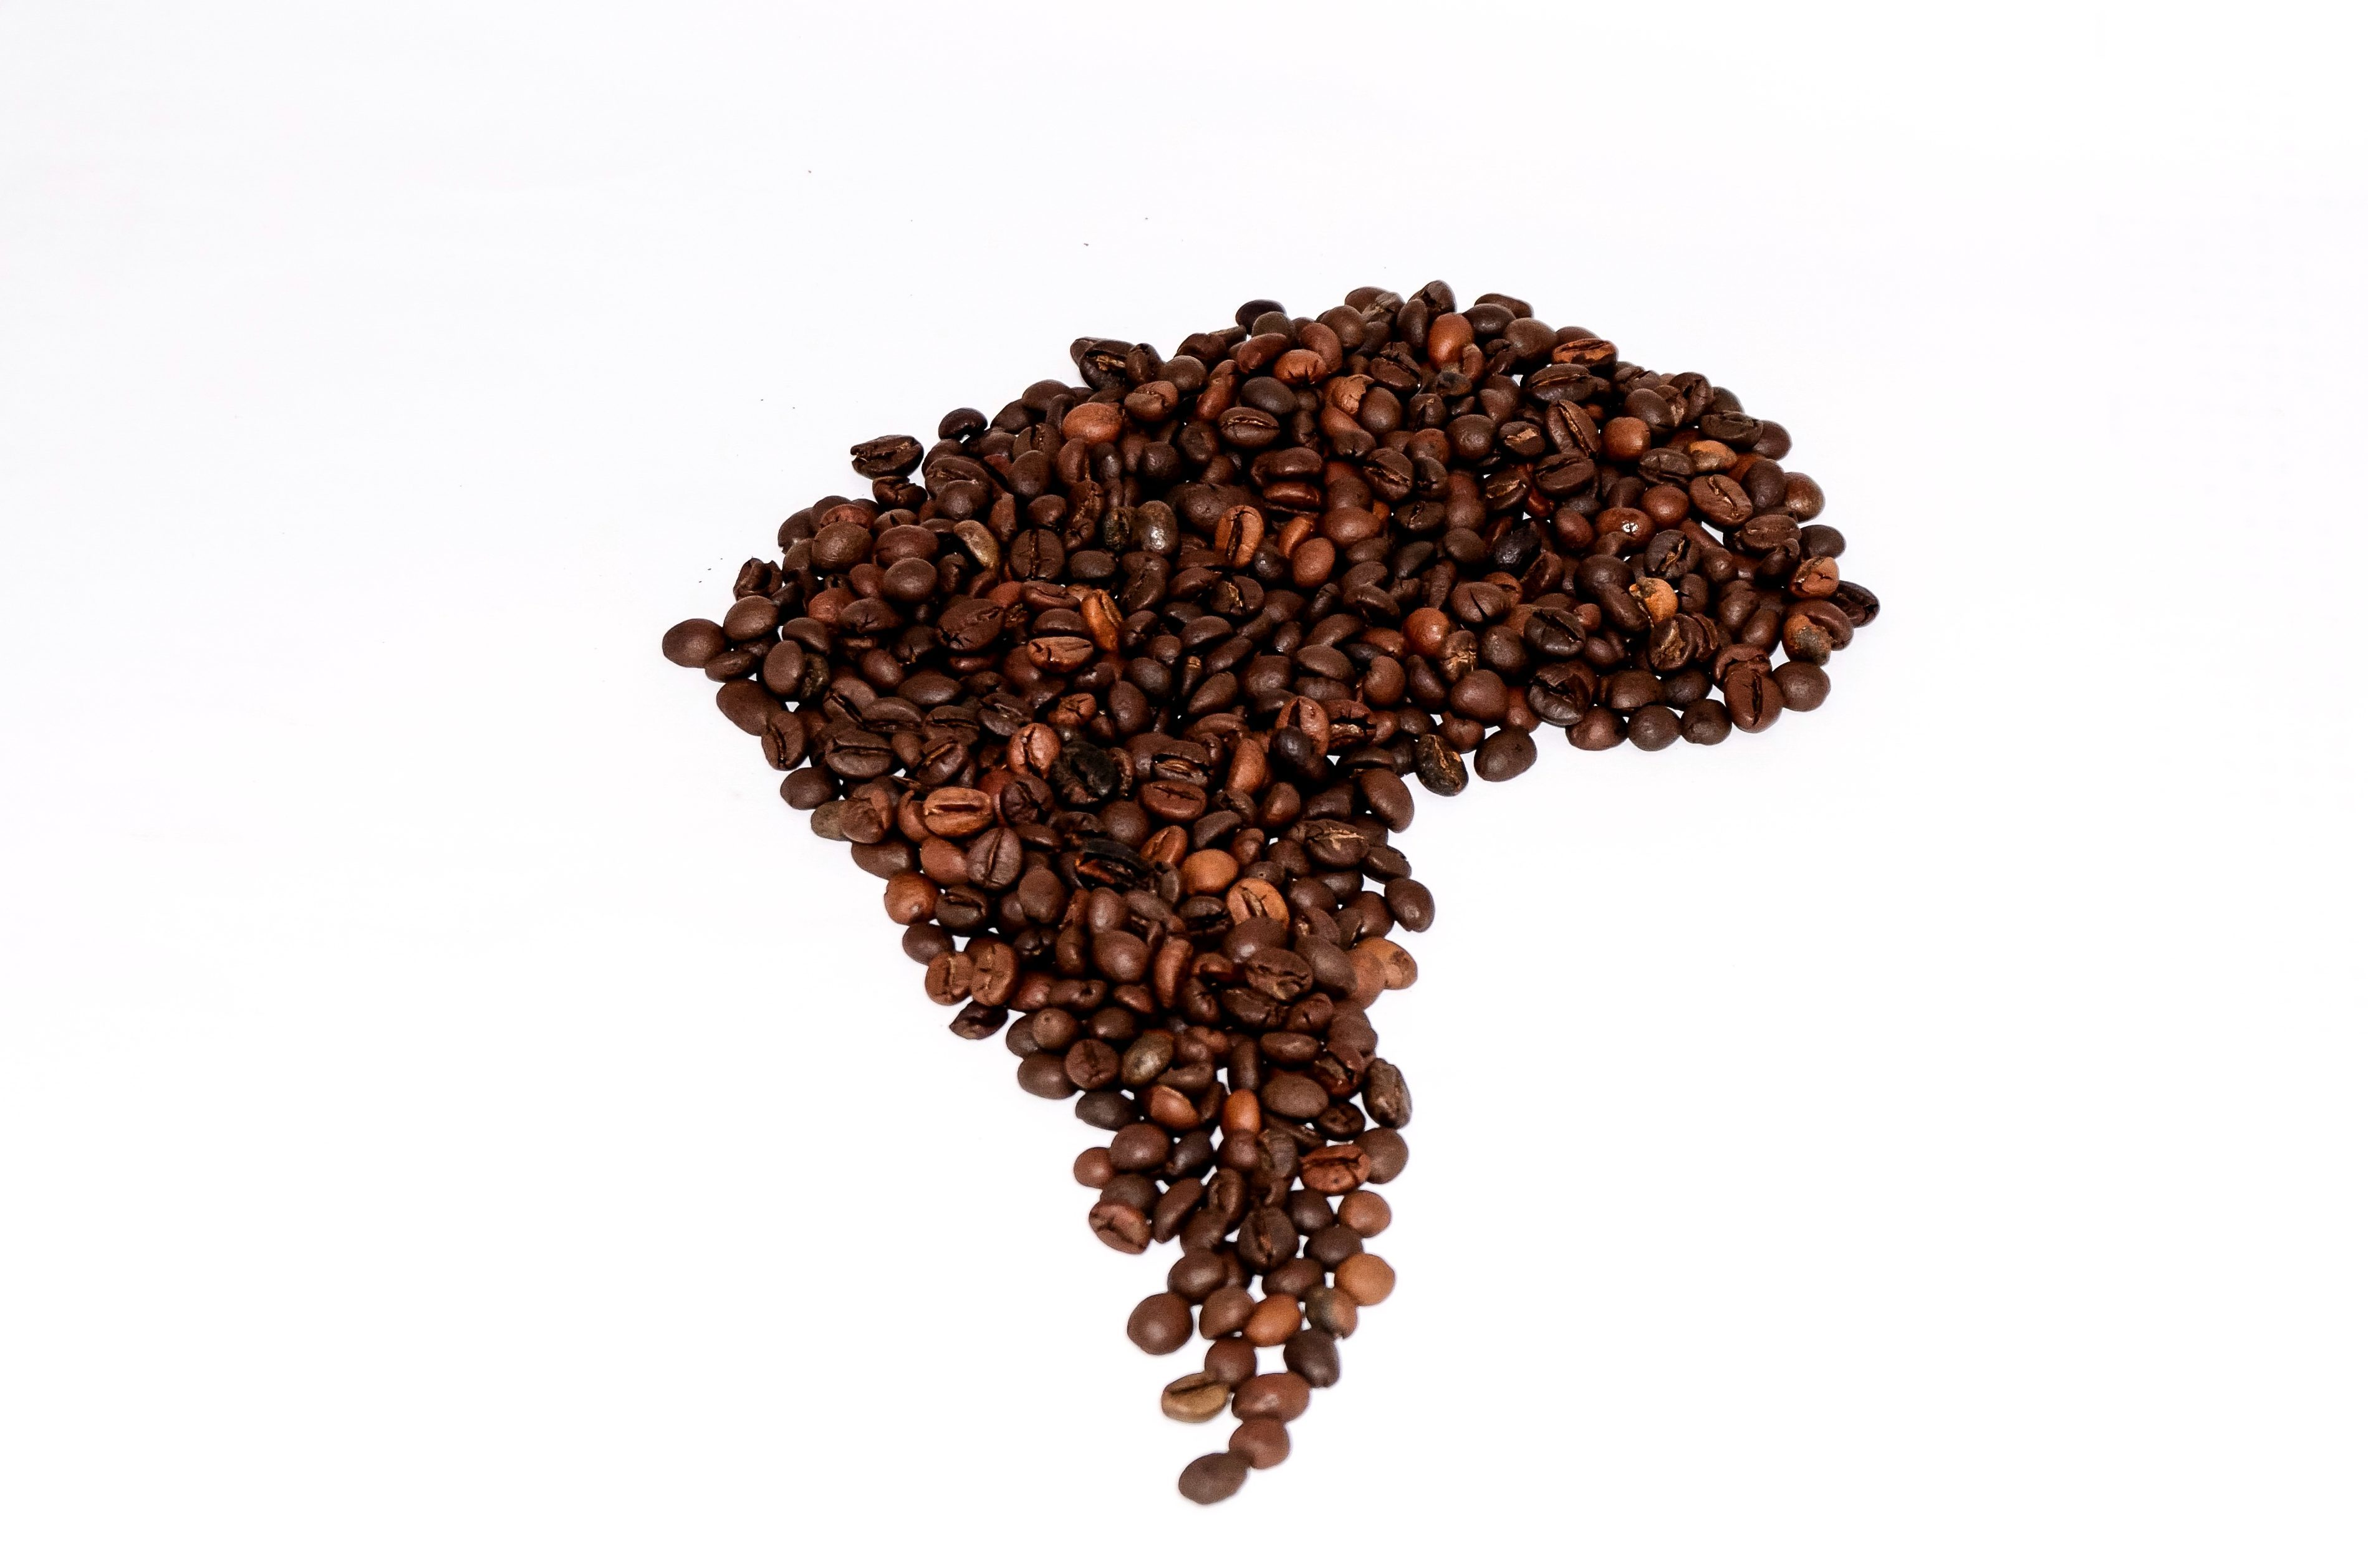 Todo sobre el café de América Latina: un sabor que traspasa fronteras